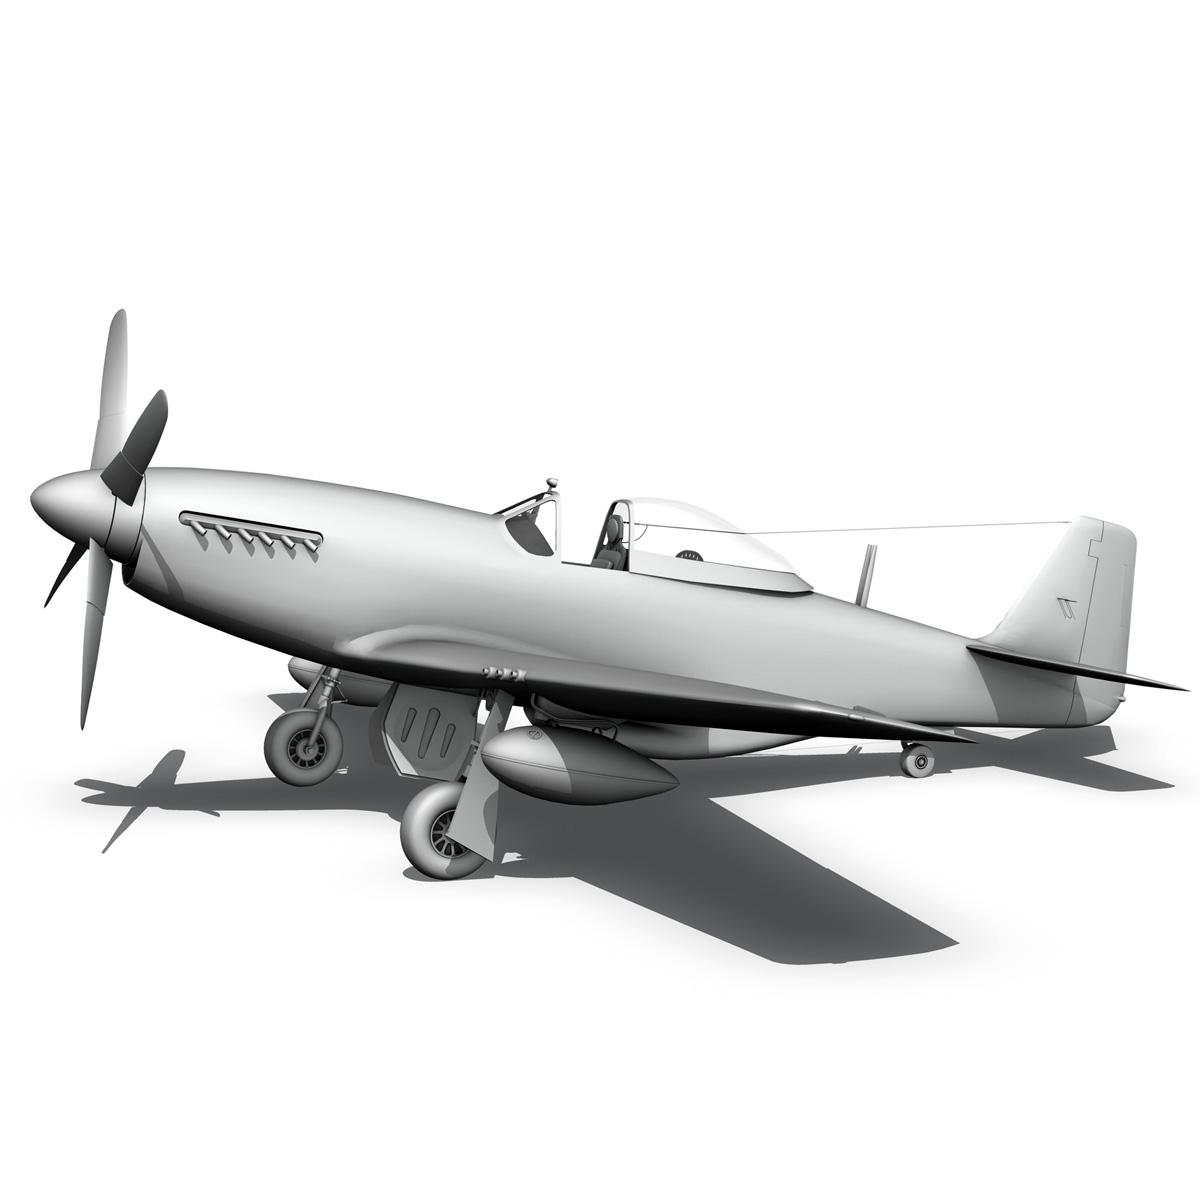 north american p-51d mustang – big beautiful doll 3d model fbx c4d lwo obj 282569